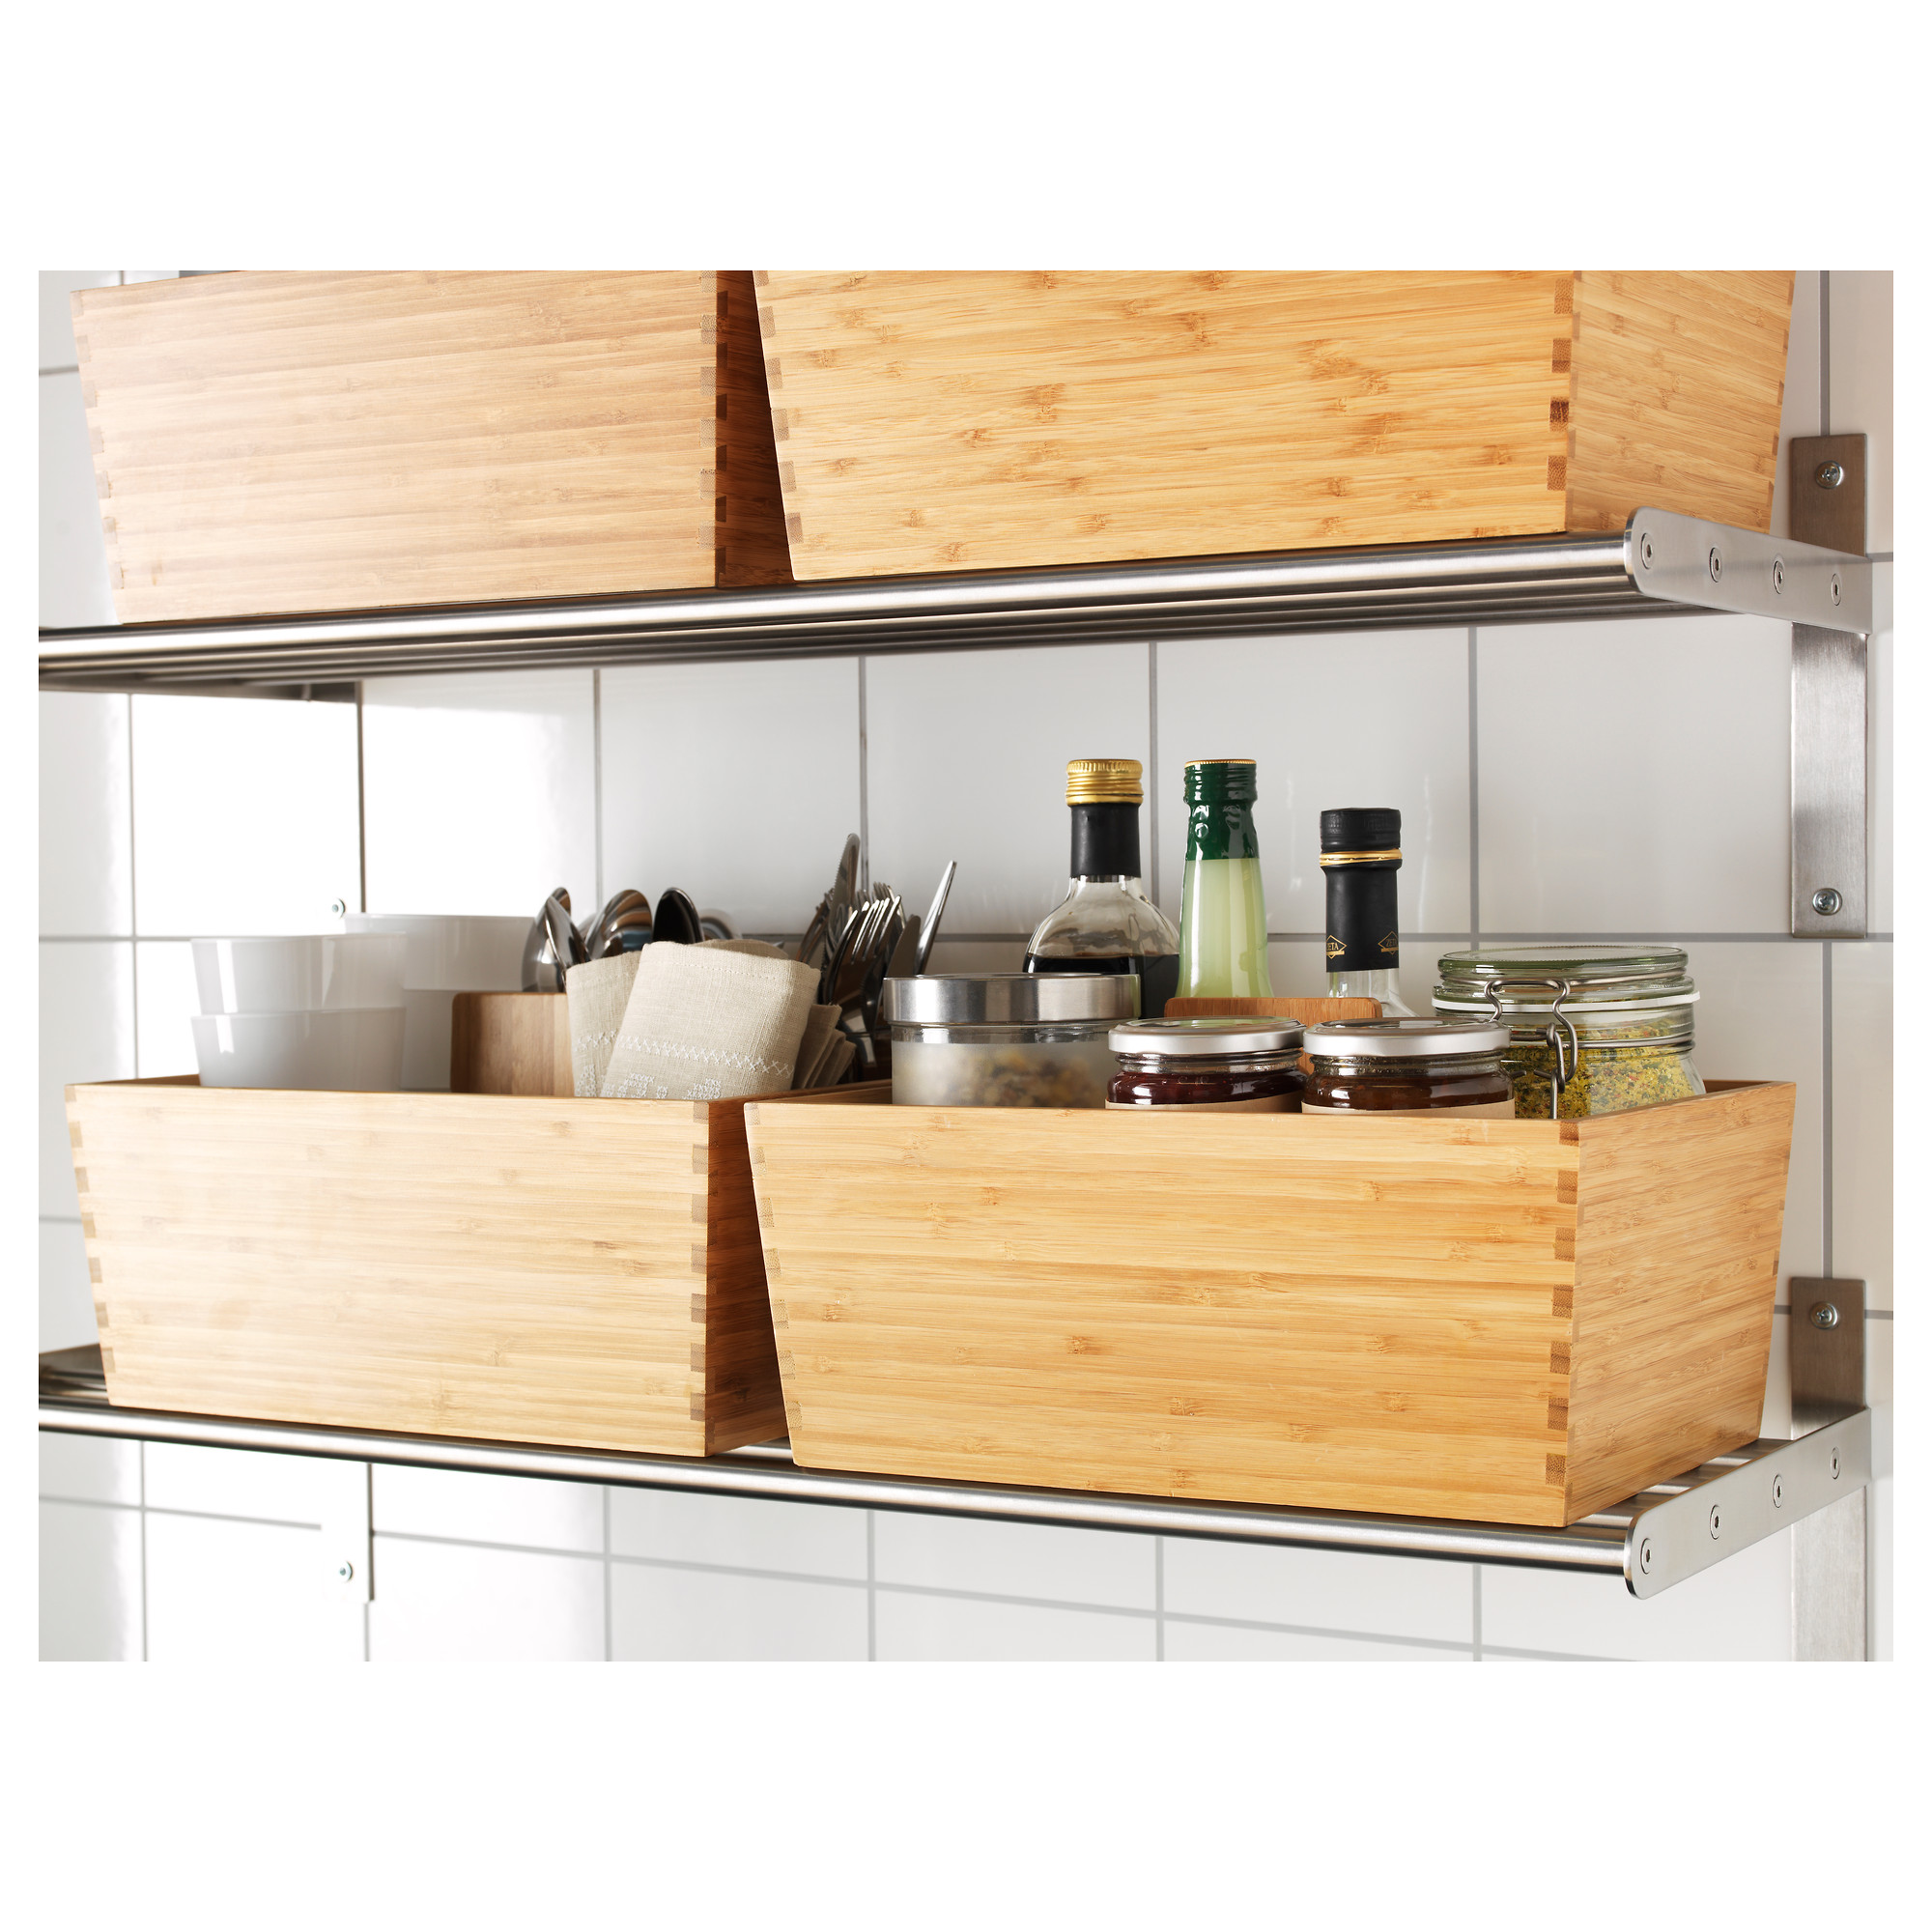 Variera Box With Handle Bamboo Ikea Indonesia